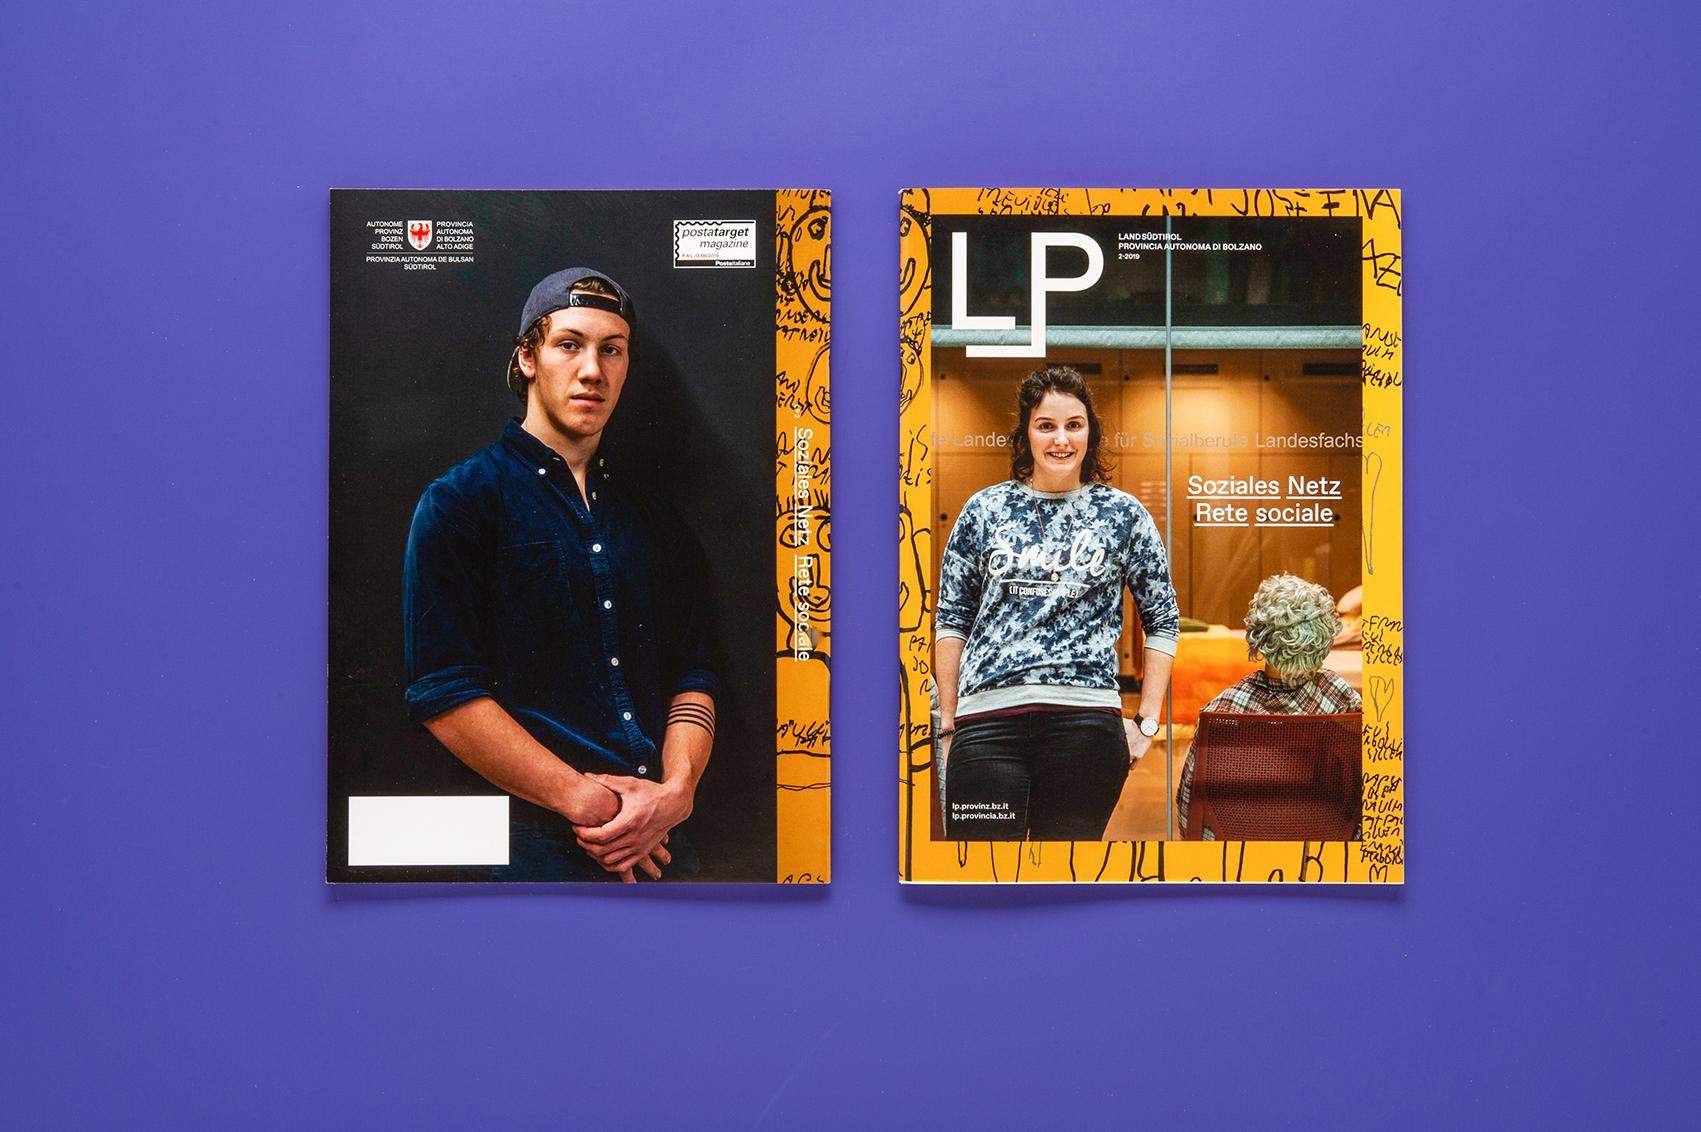 LP Magazine N.2 / Gianluca Camillini, Matteo Moretti / Foto: FIl